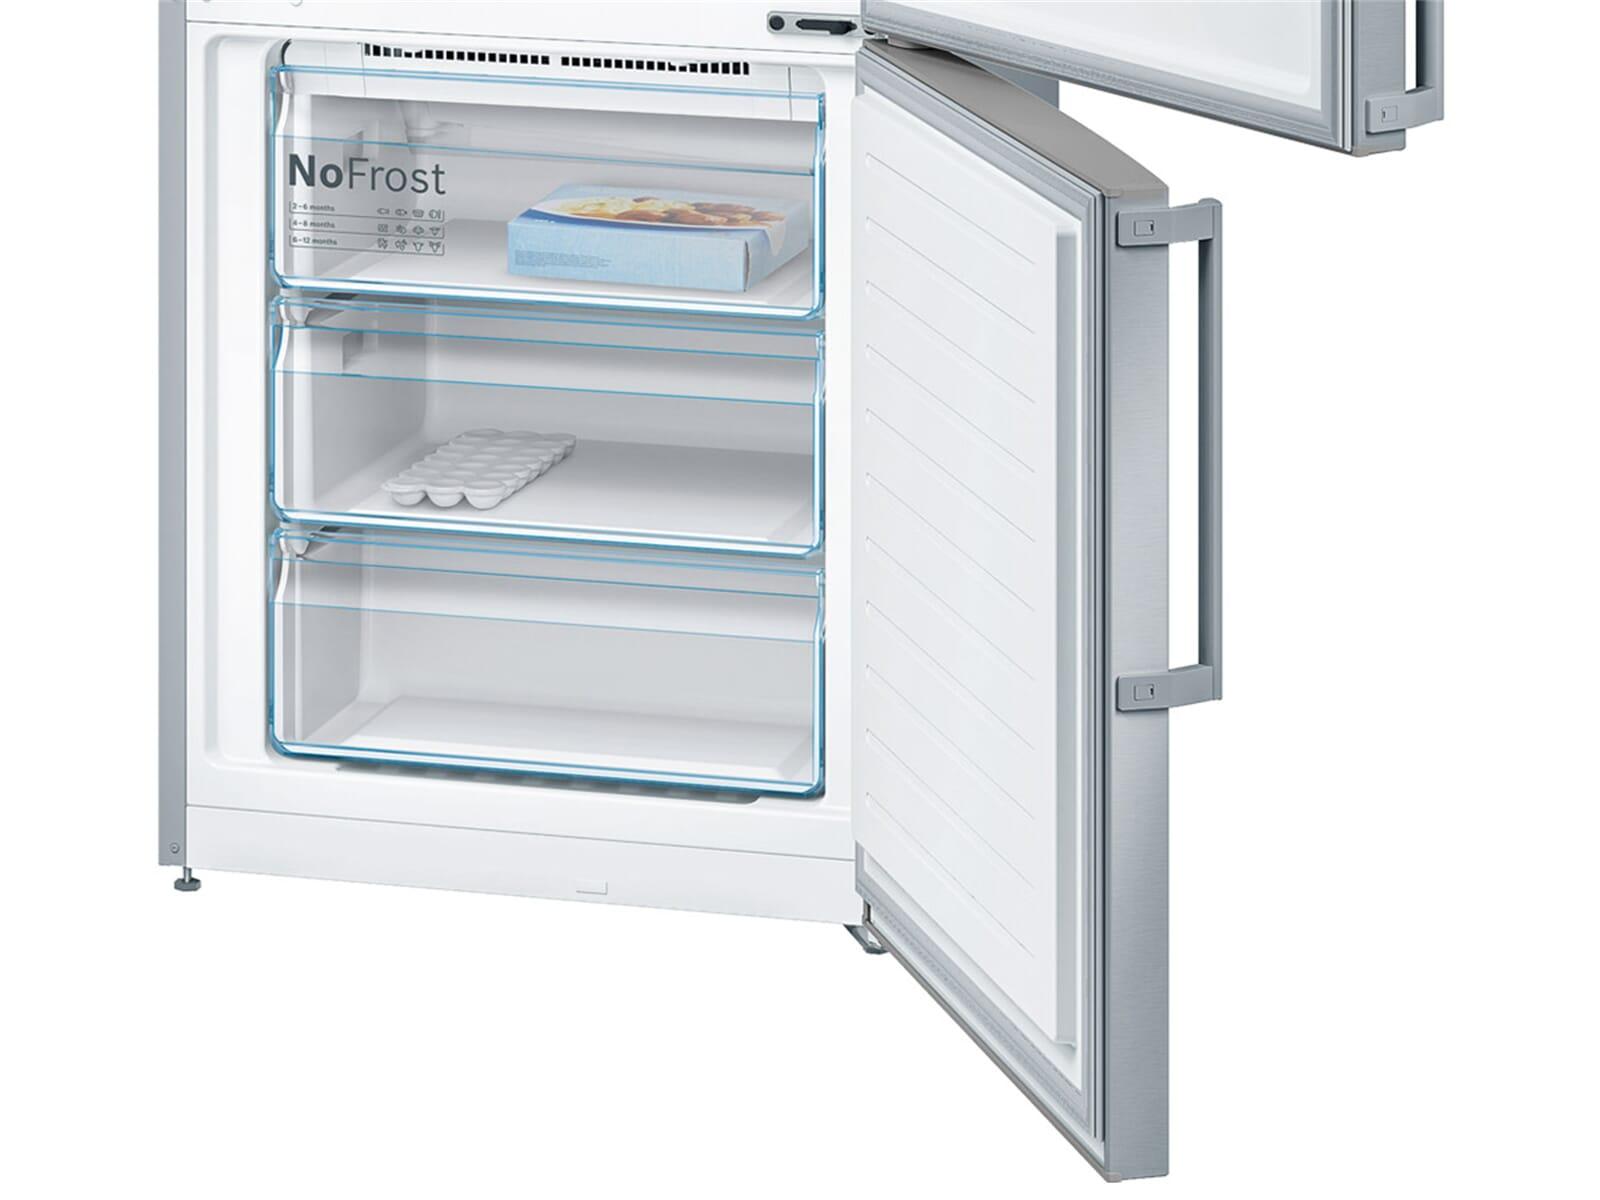 Bosch Kühlschrank No Frost : Bosch kgn xi kühl gefrierkombination edelstahl